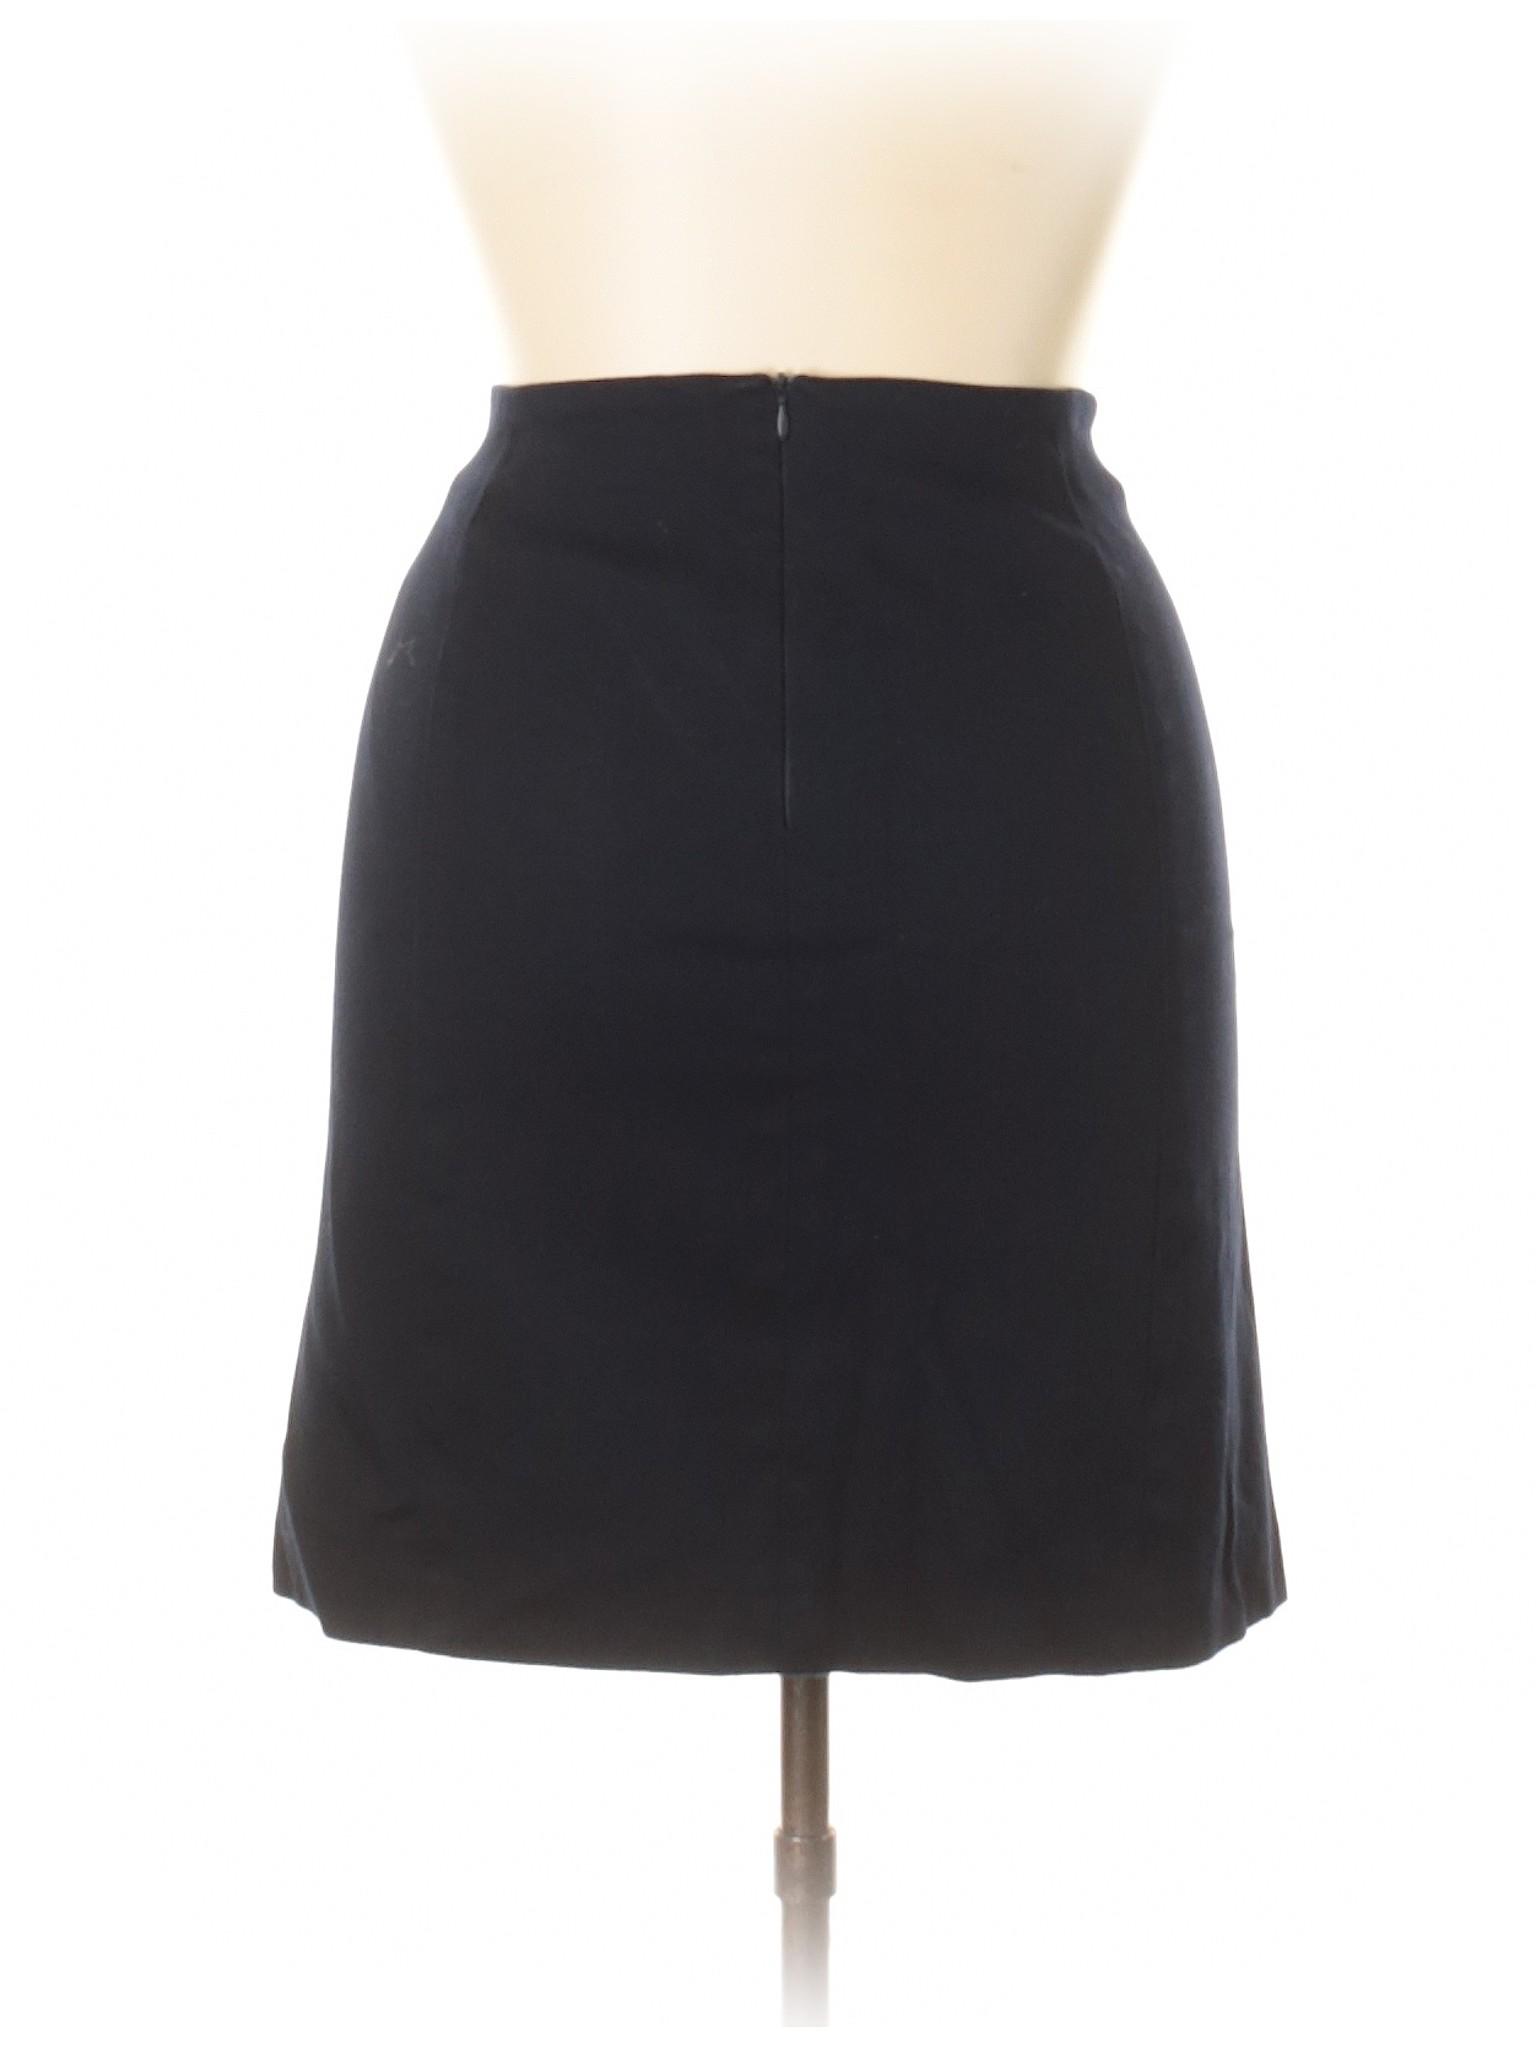 Premise Casual Boutique Studio Boutique Skirt Studio Premise Casual vgwFHZnq